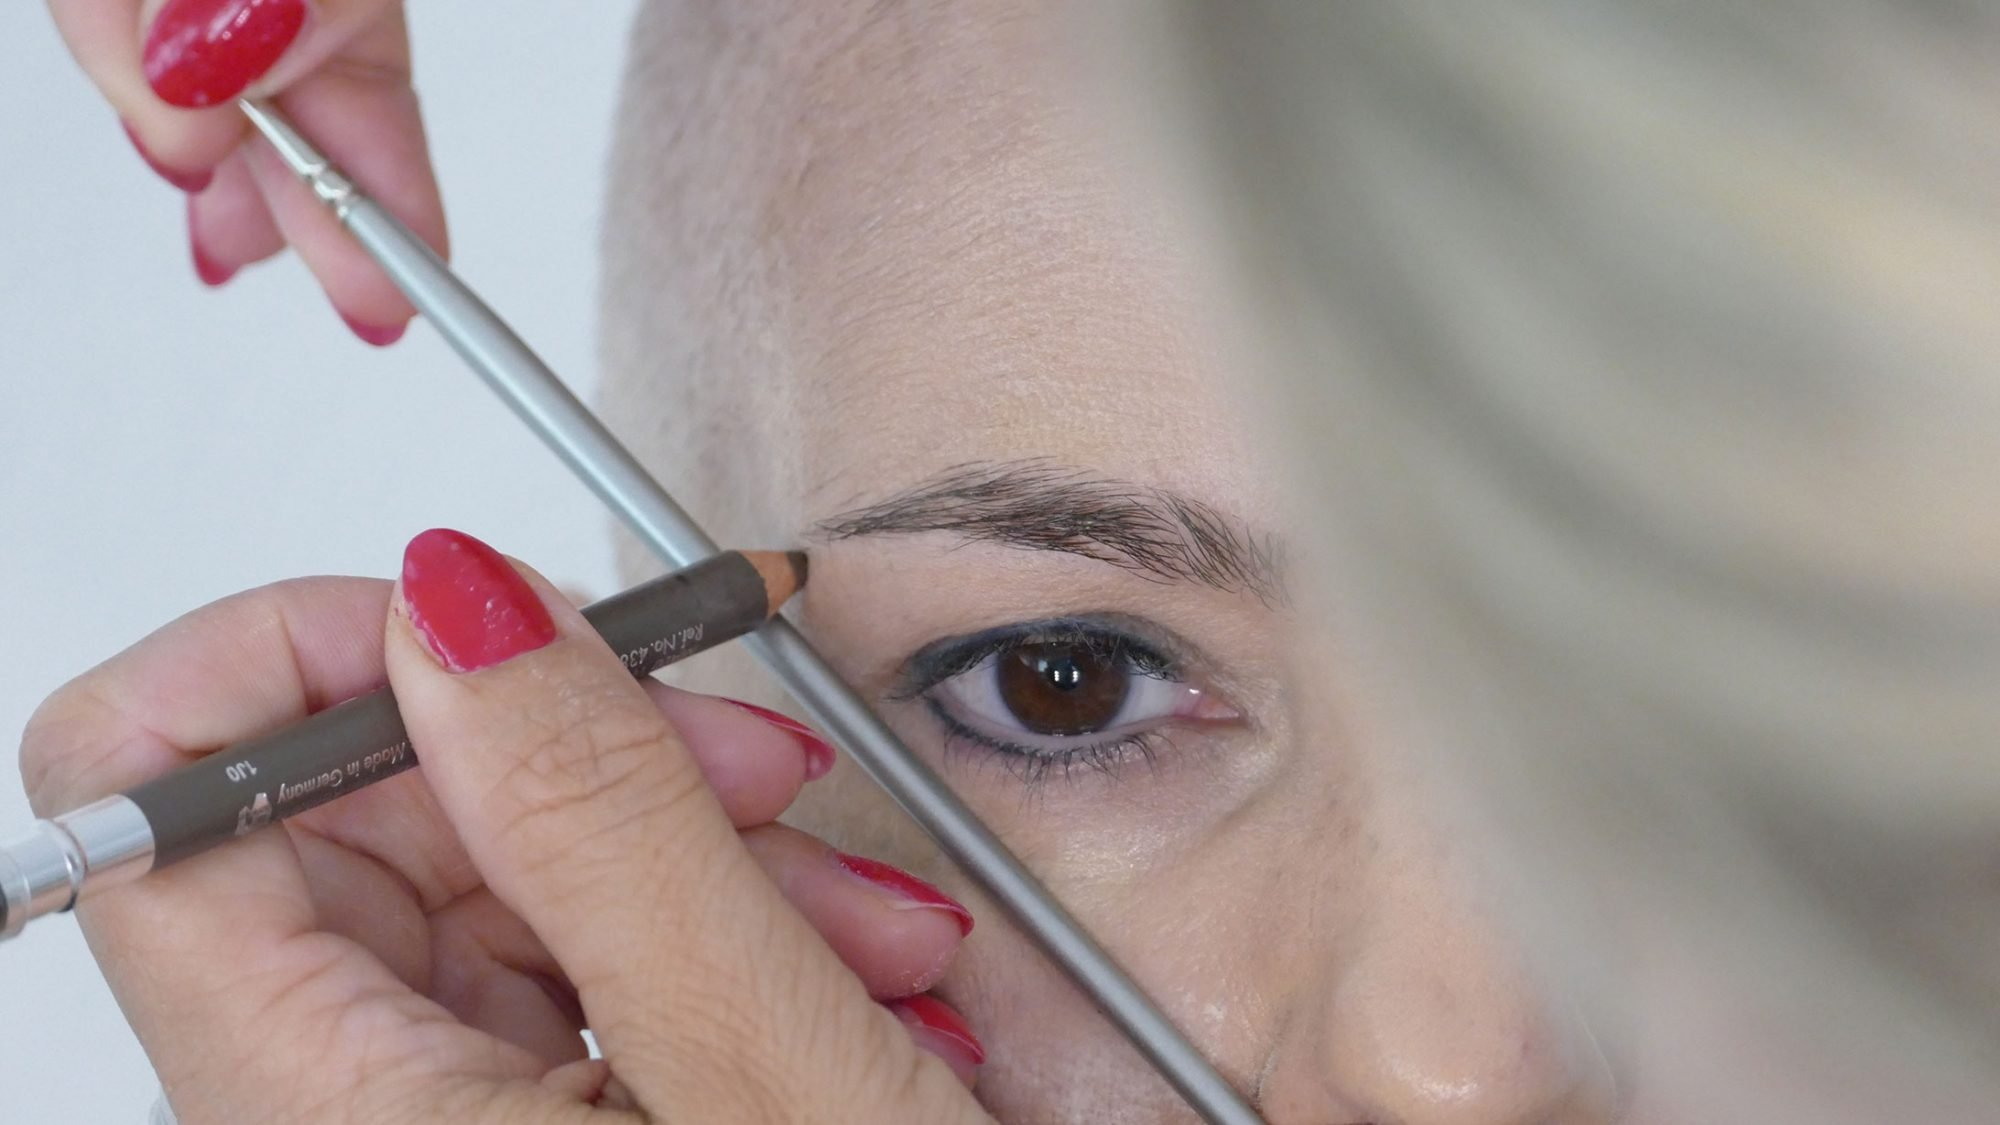 Schminken bei Chemotherapie: Beginn der Augenbrauen festlegen.